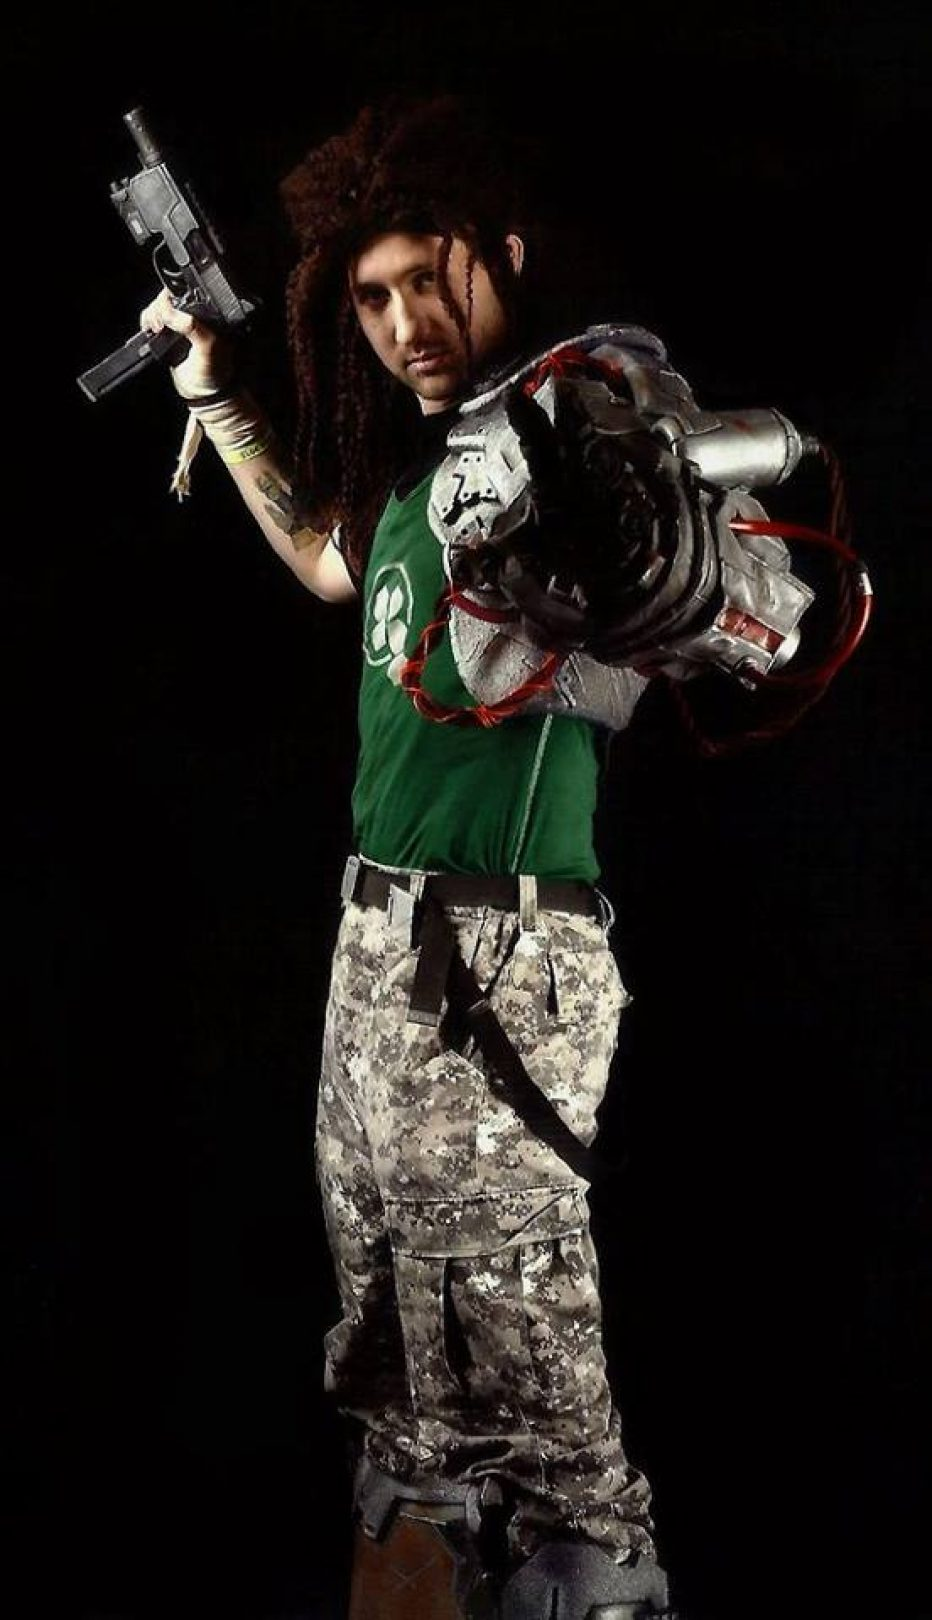 Bionic-Commando-Nathan-Spencer-Cosplay-Gamers-Heroes-5.jpg